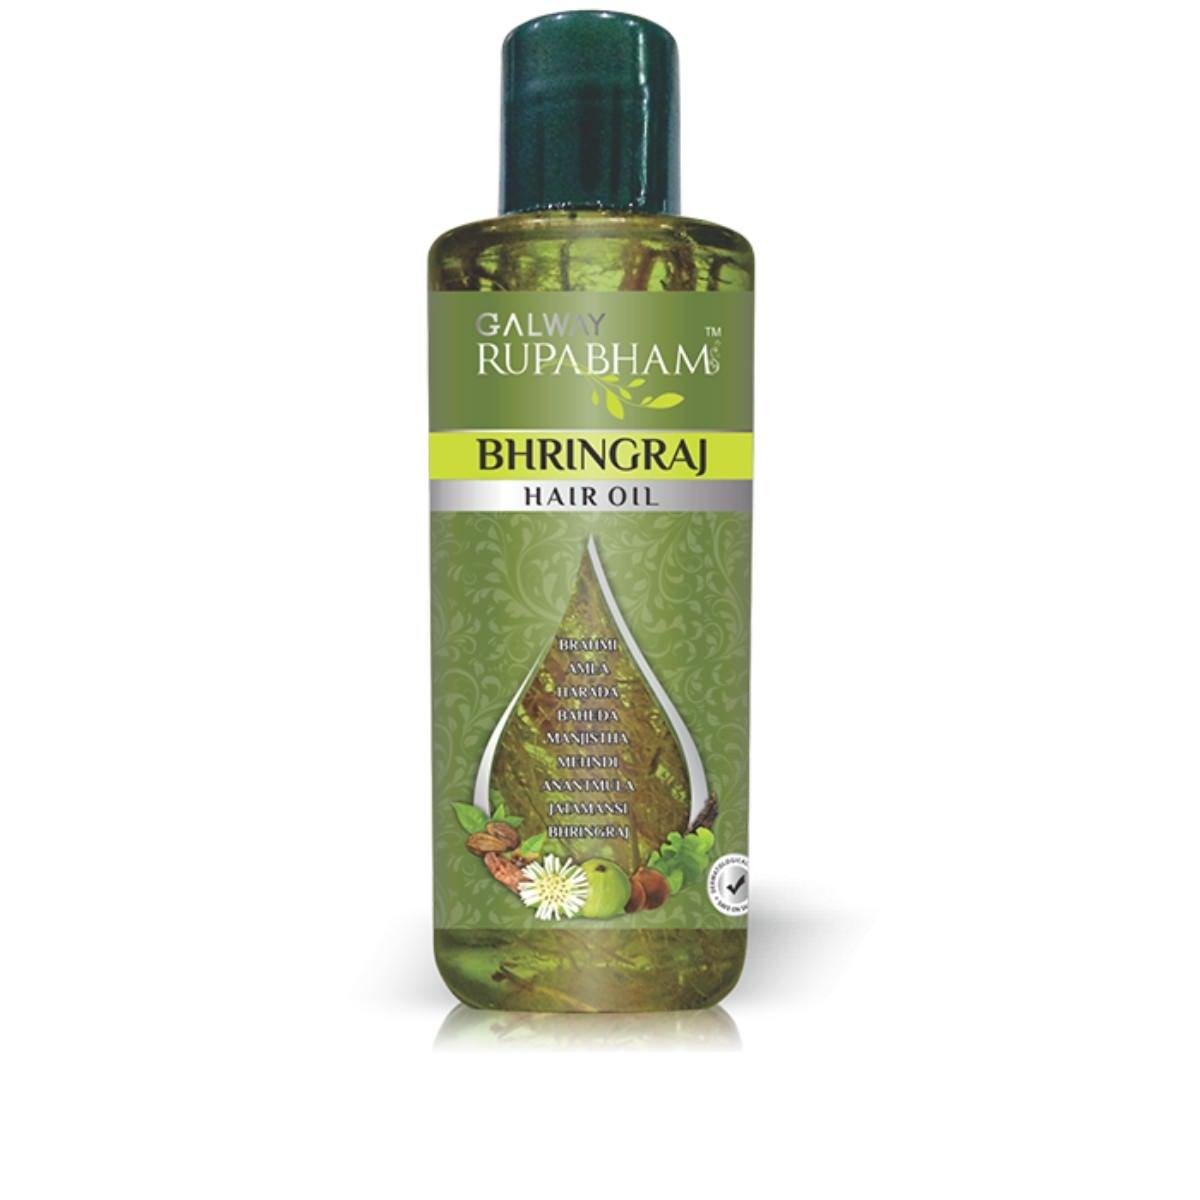 Galway Rupabham Bhringraj Hair Oil Image